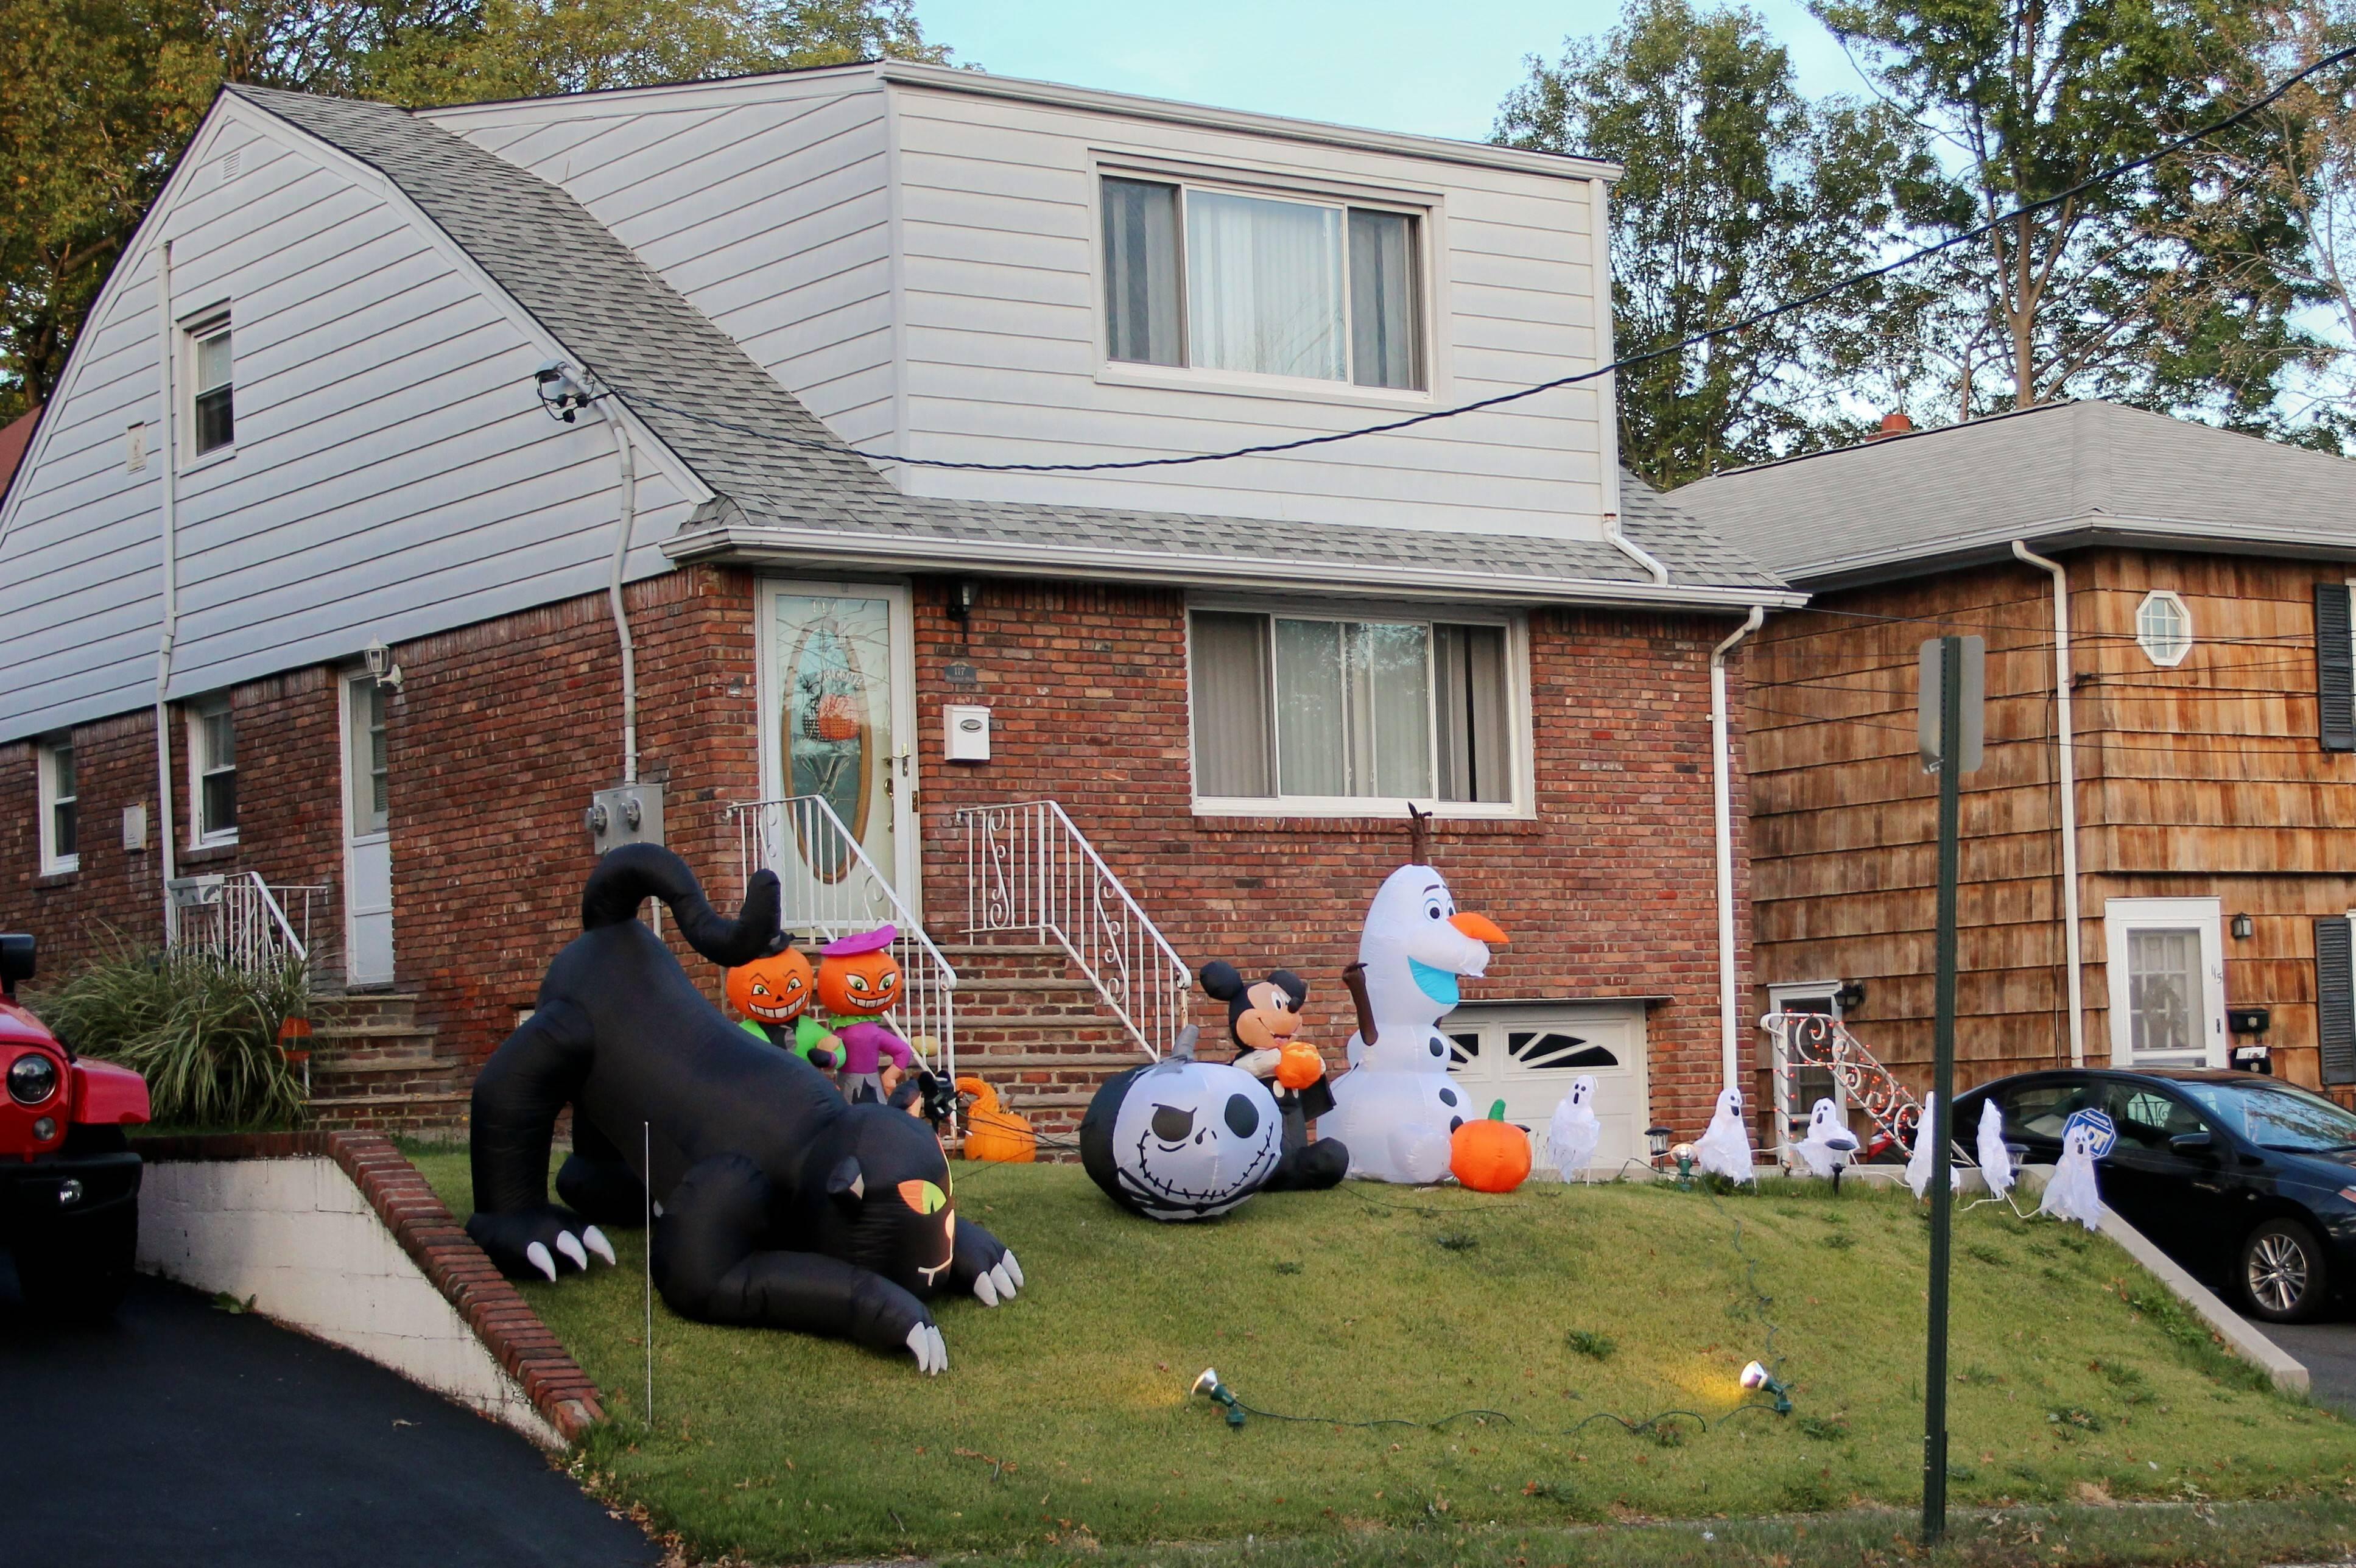 35bf8c798b528814f851_Halloween_Hoover_Ave_Bloomfield.jpg